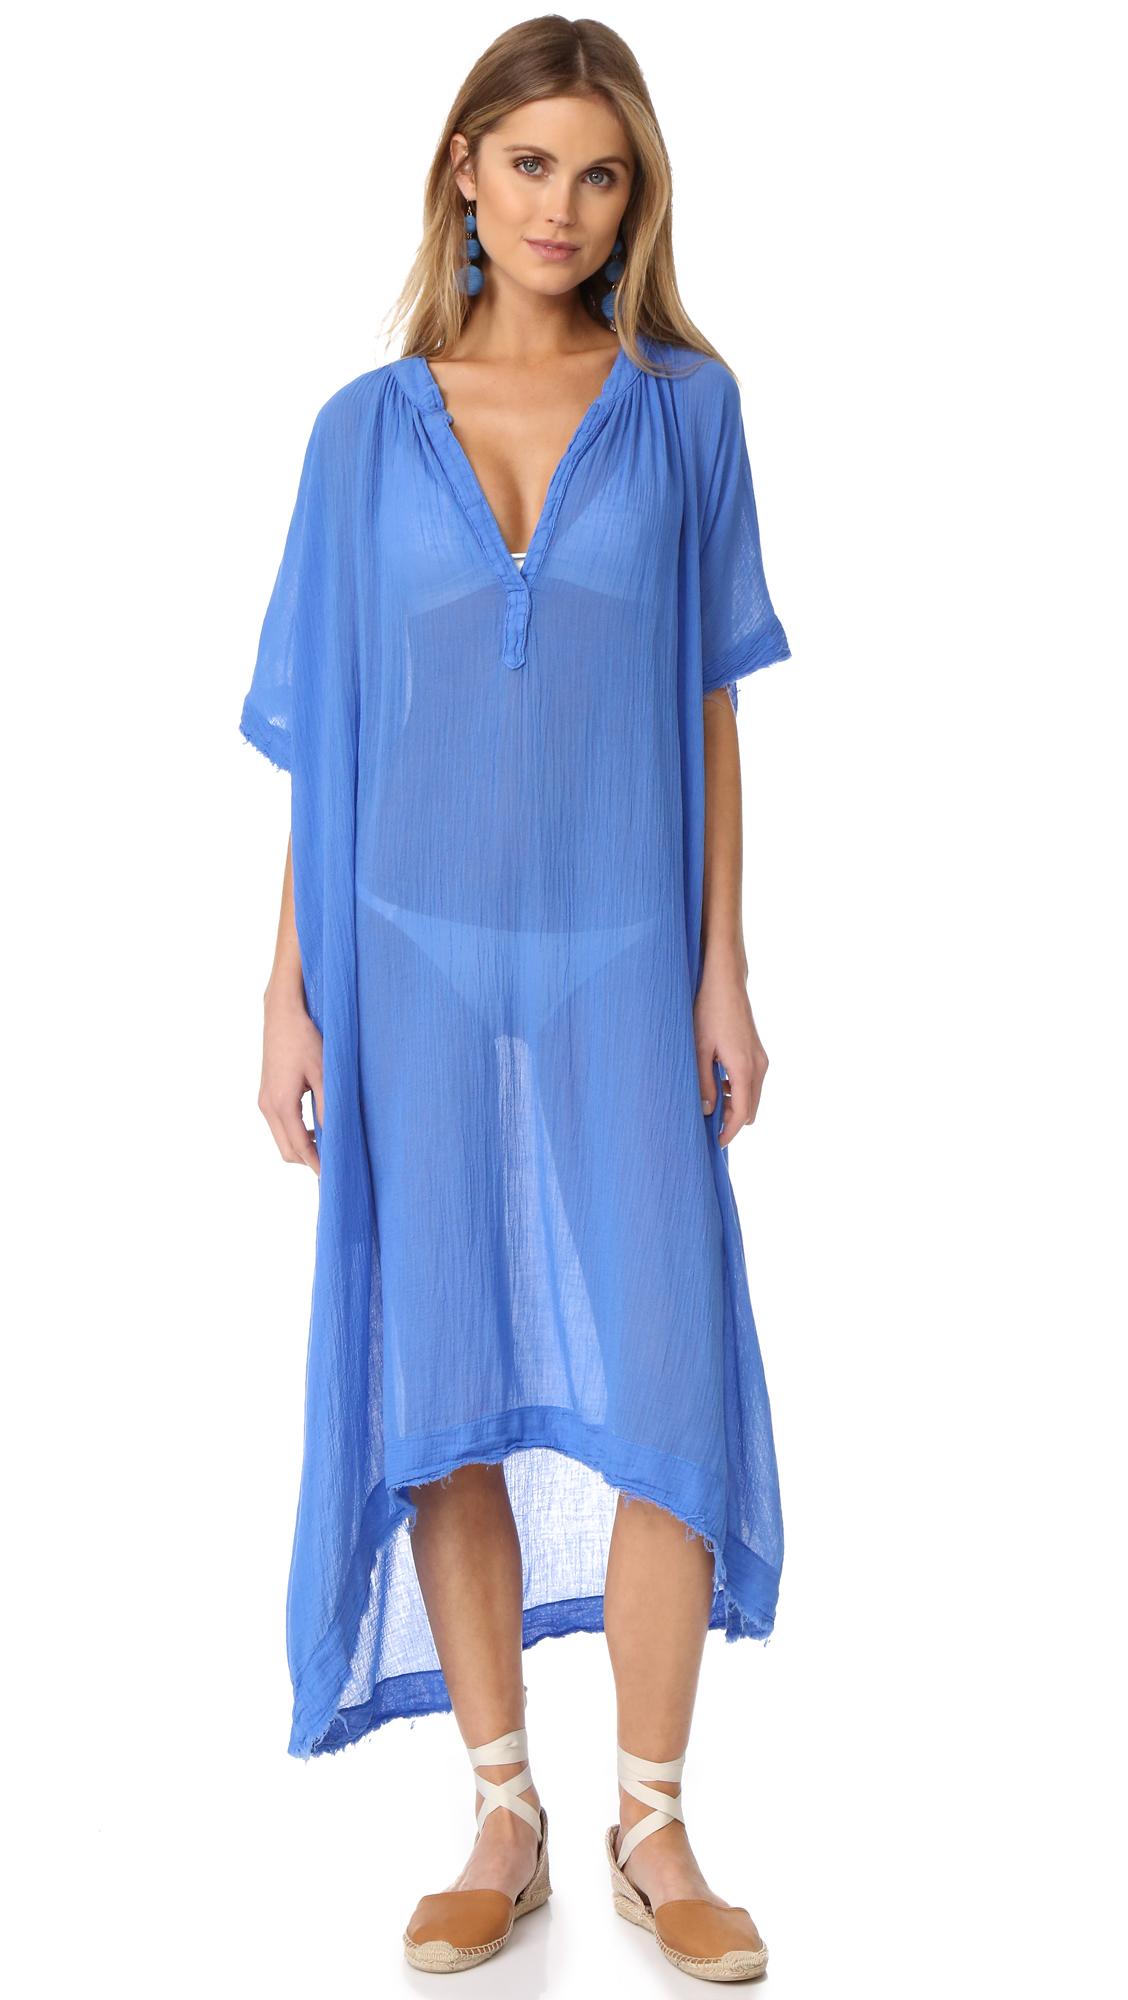 9SEED Tunisia Short Sleeve Caftan in Blue